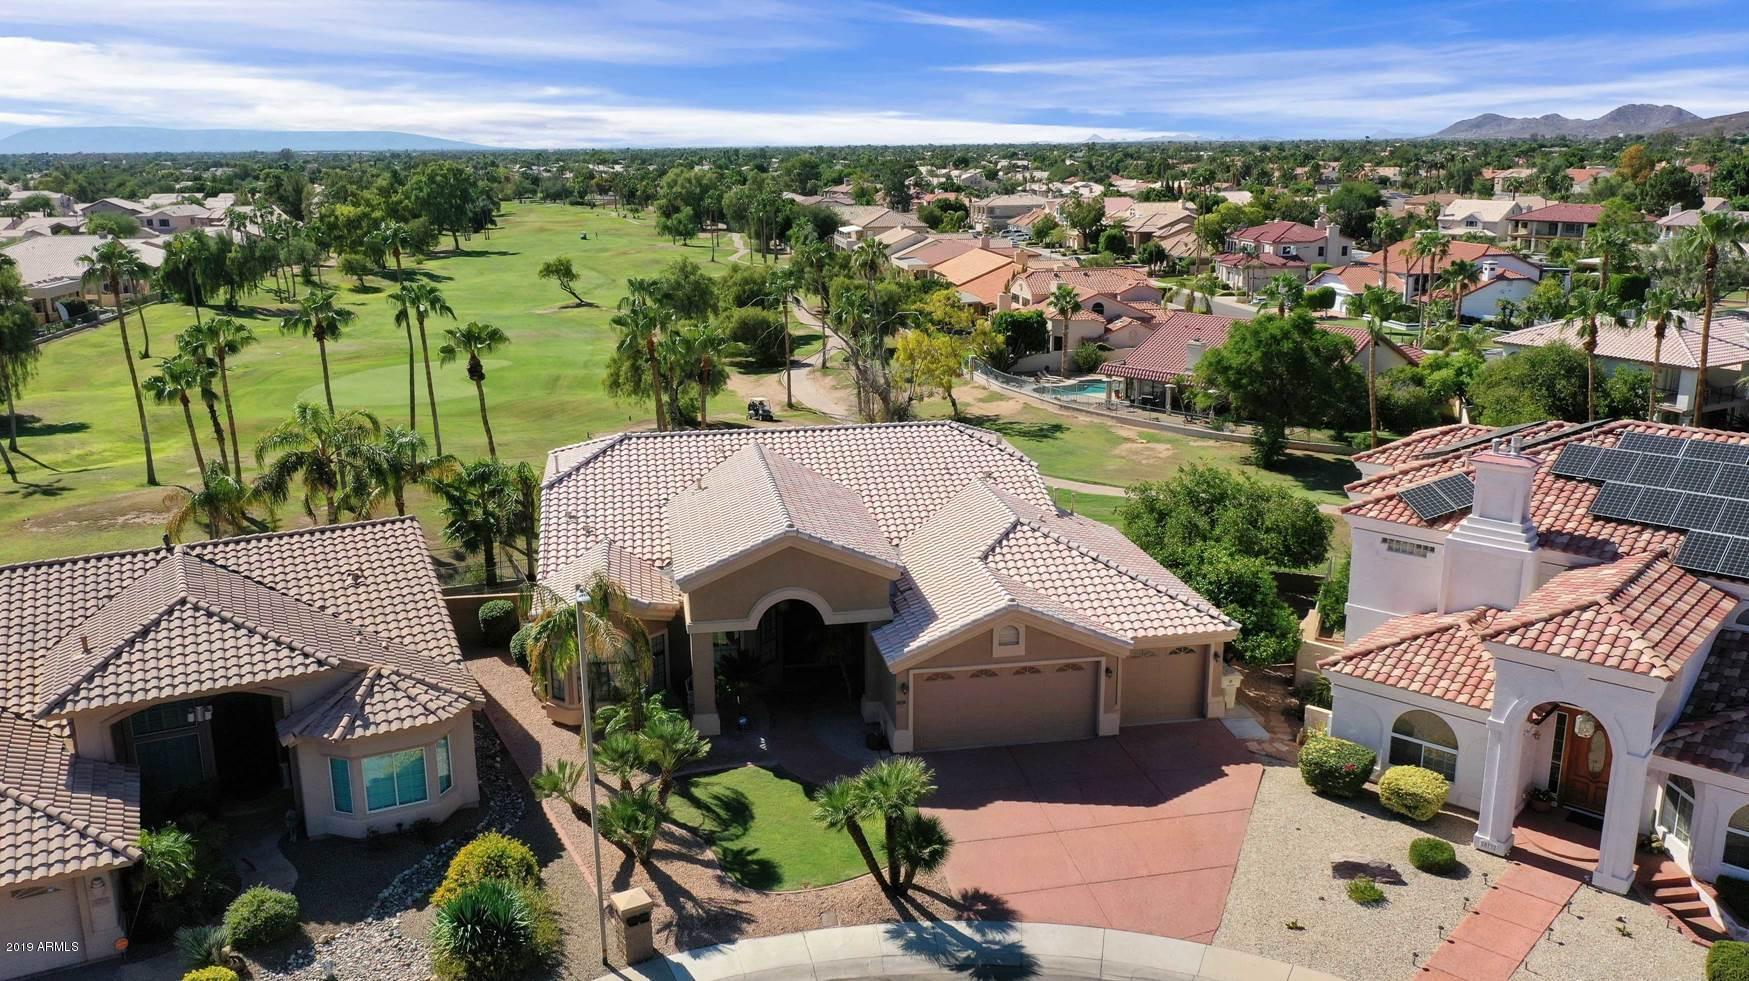 Photo of 20726 N 56TH Avenue, Glendale, AZ 85308